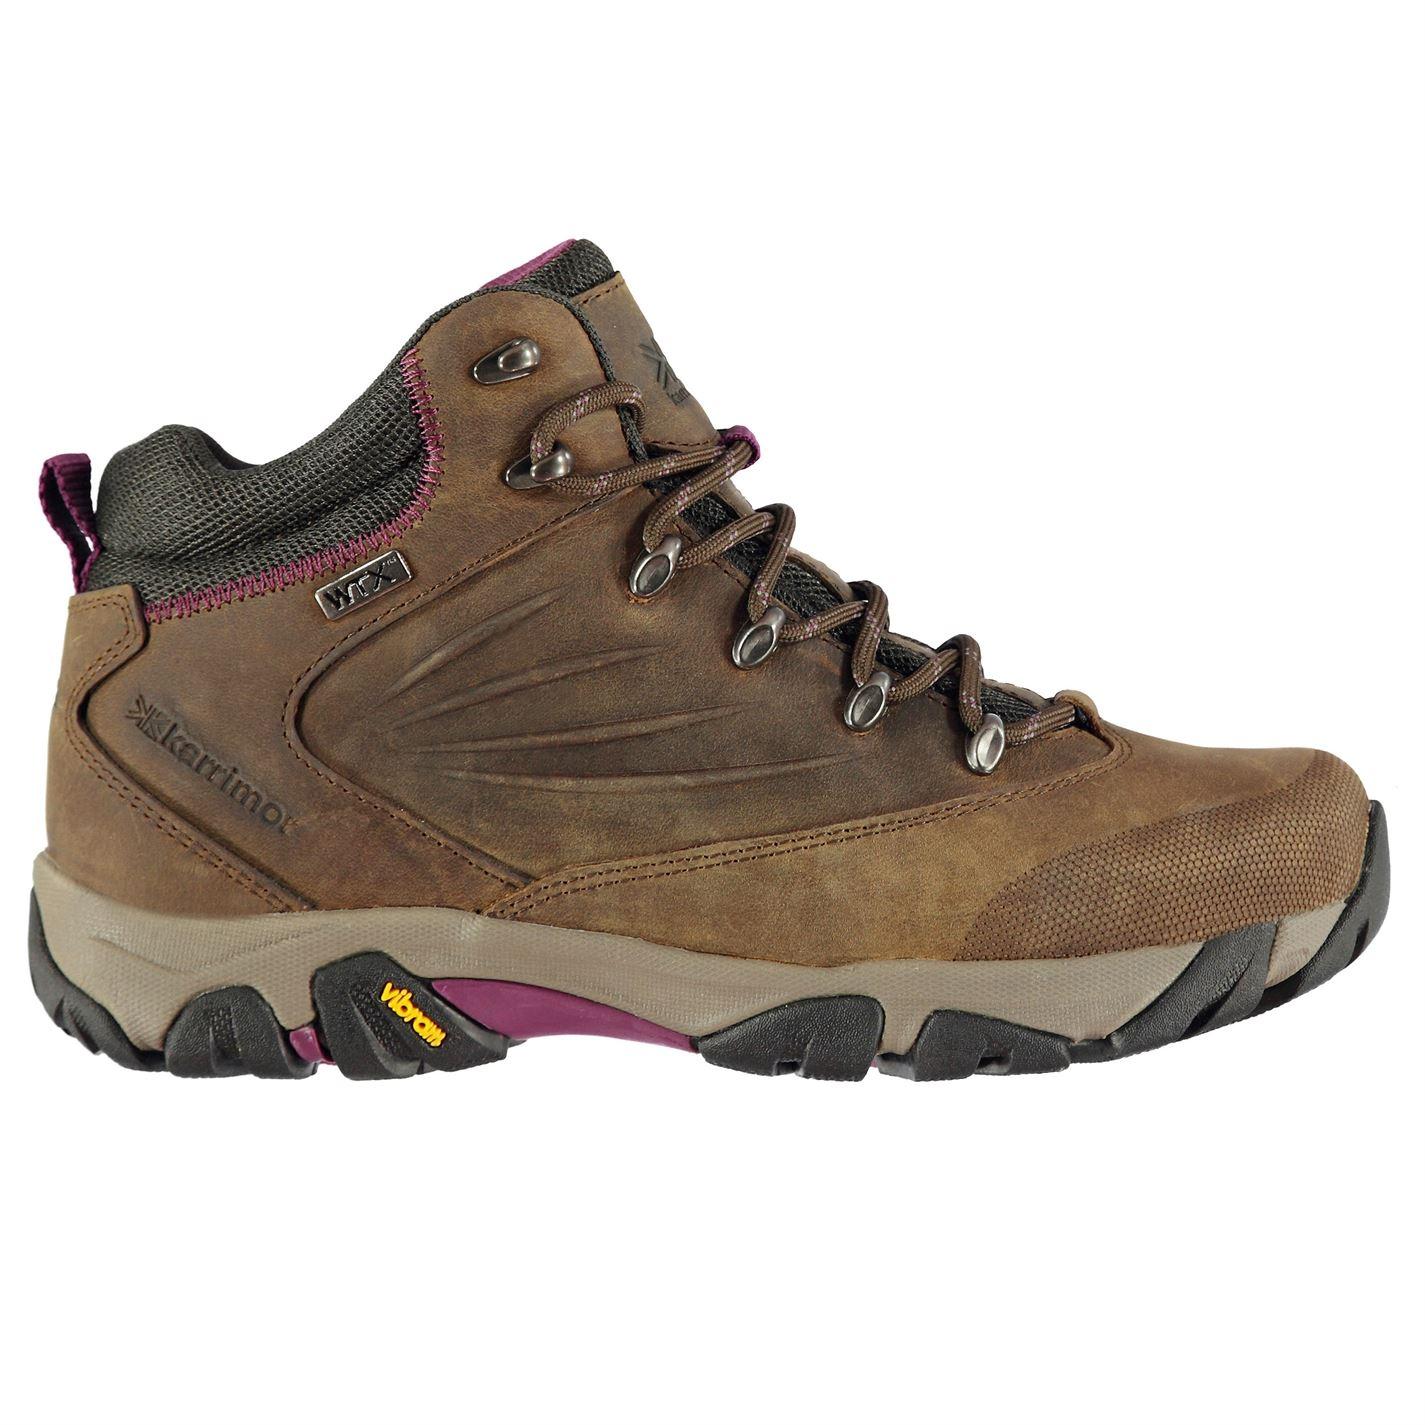 Karrimor Kinder Ladies Walking Boots